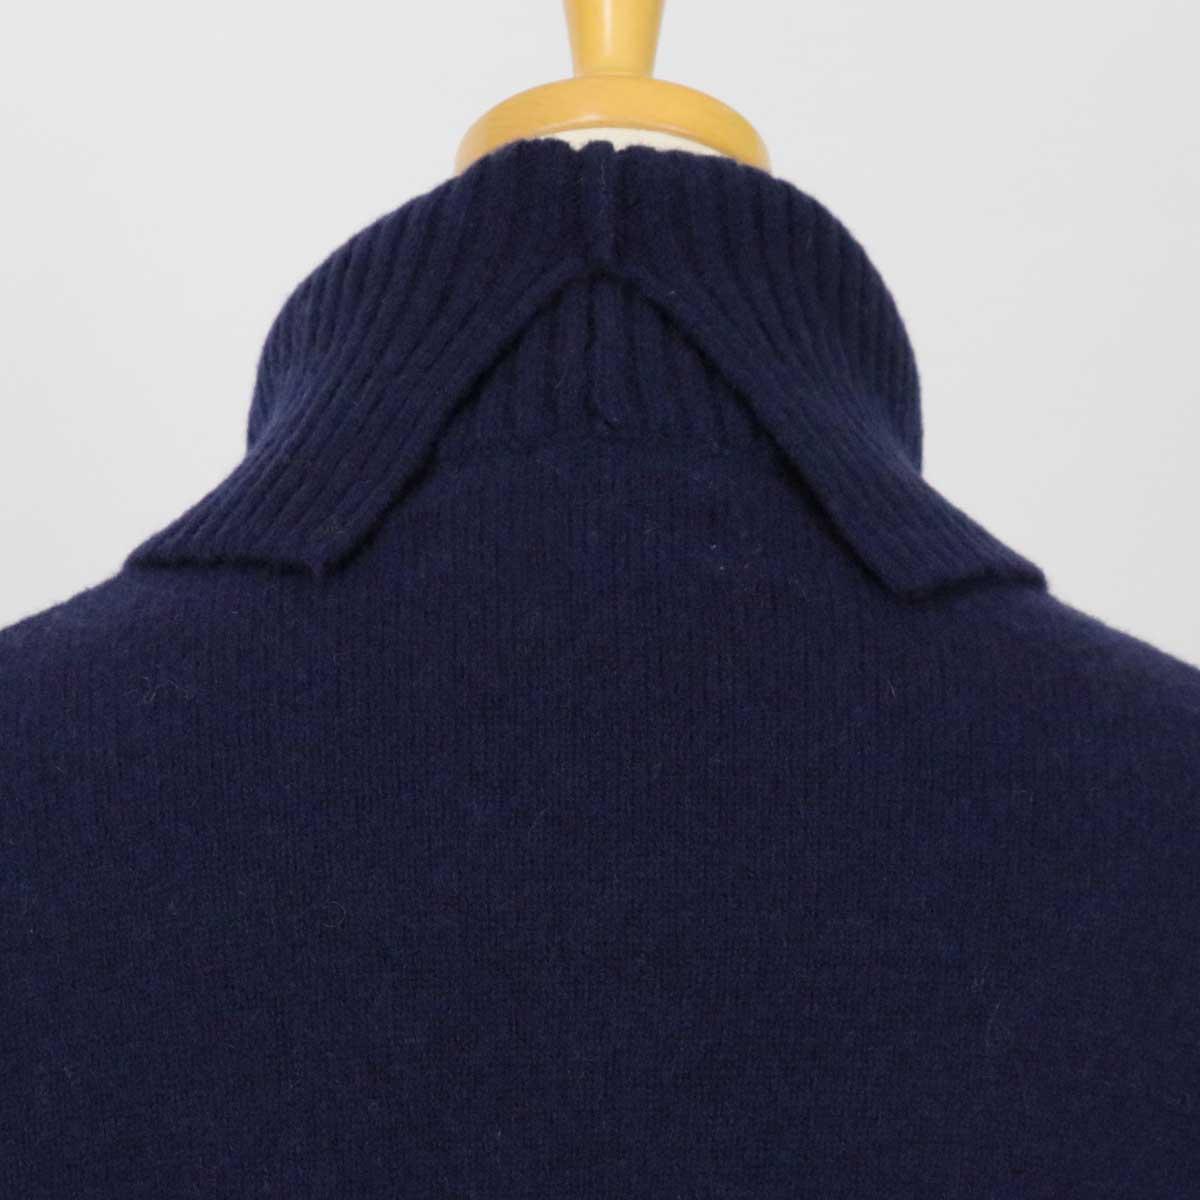 NATURAL LAUNDRY ナチュラルランドリー ラムウール 縮絨 チュニック セーター